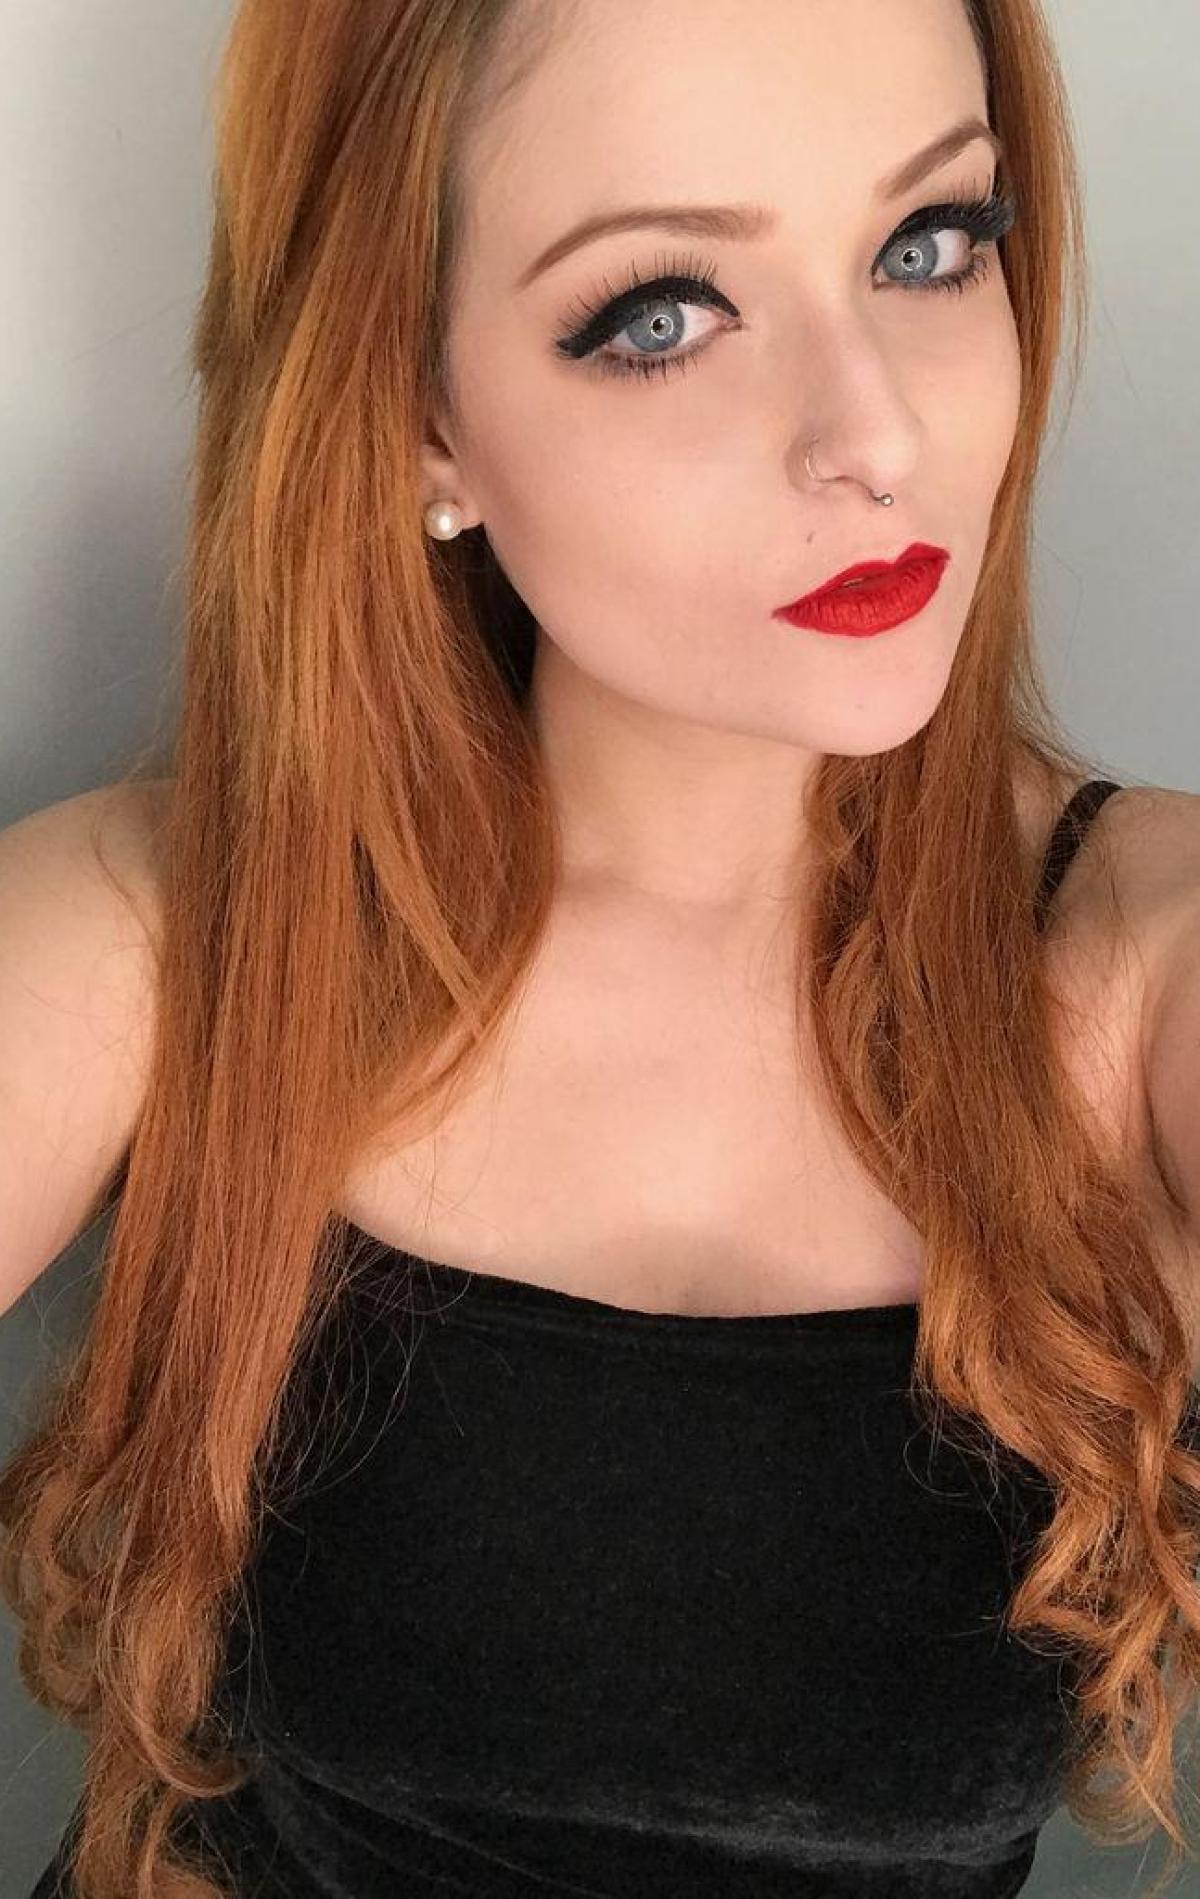 Camgirl RedHeadGirlx olhos azuis